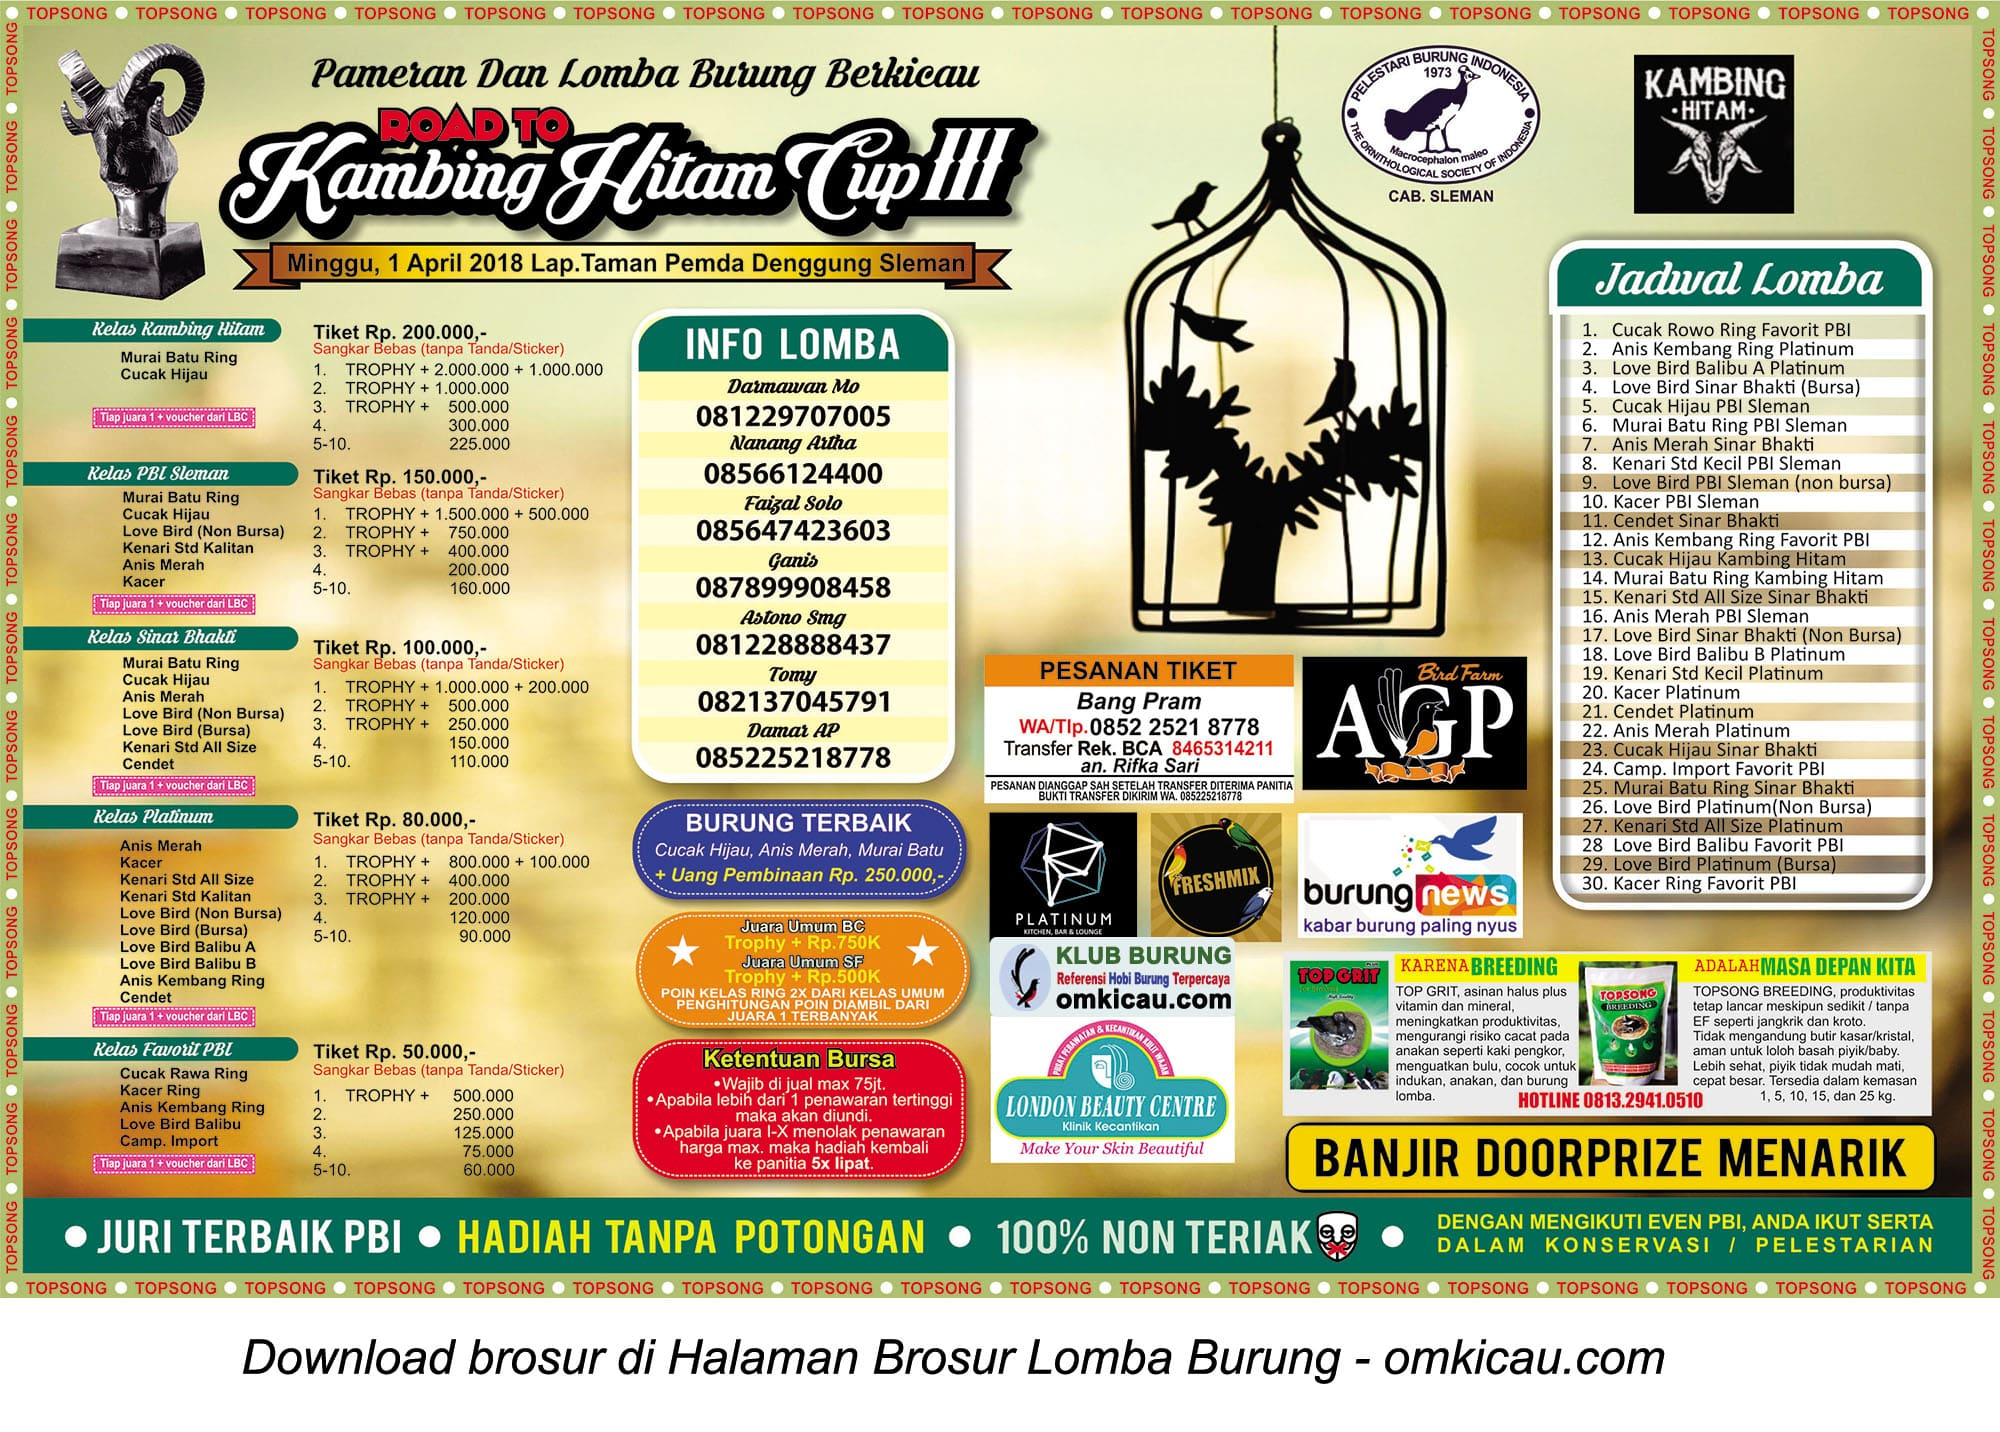 Road to Kambing Hitam Cup III